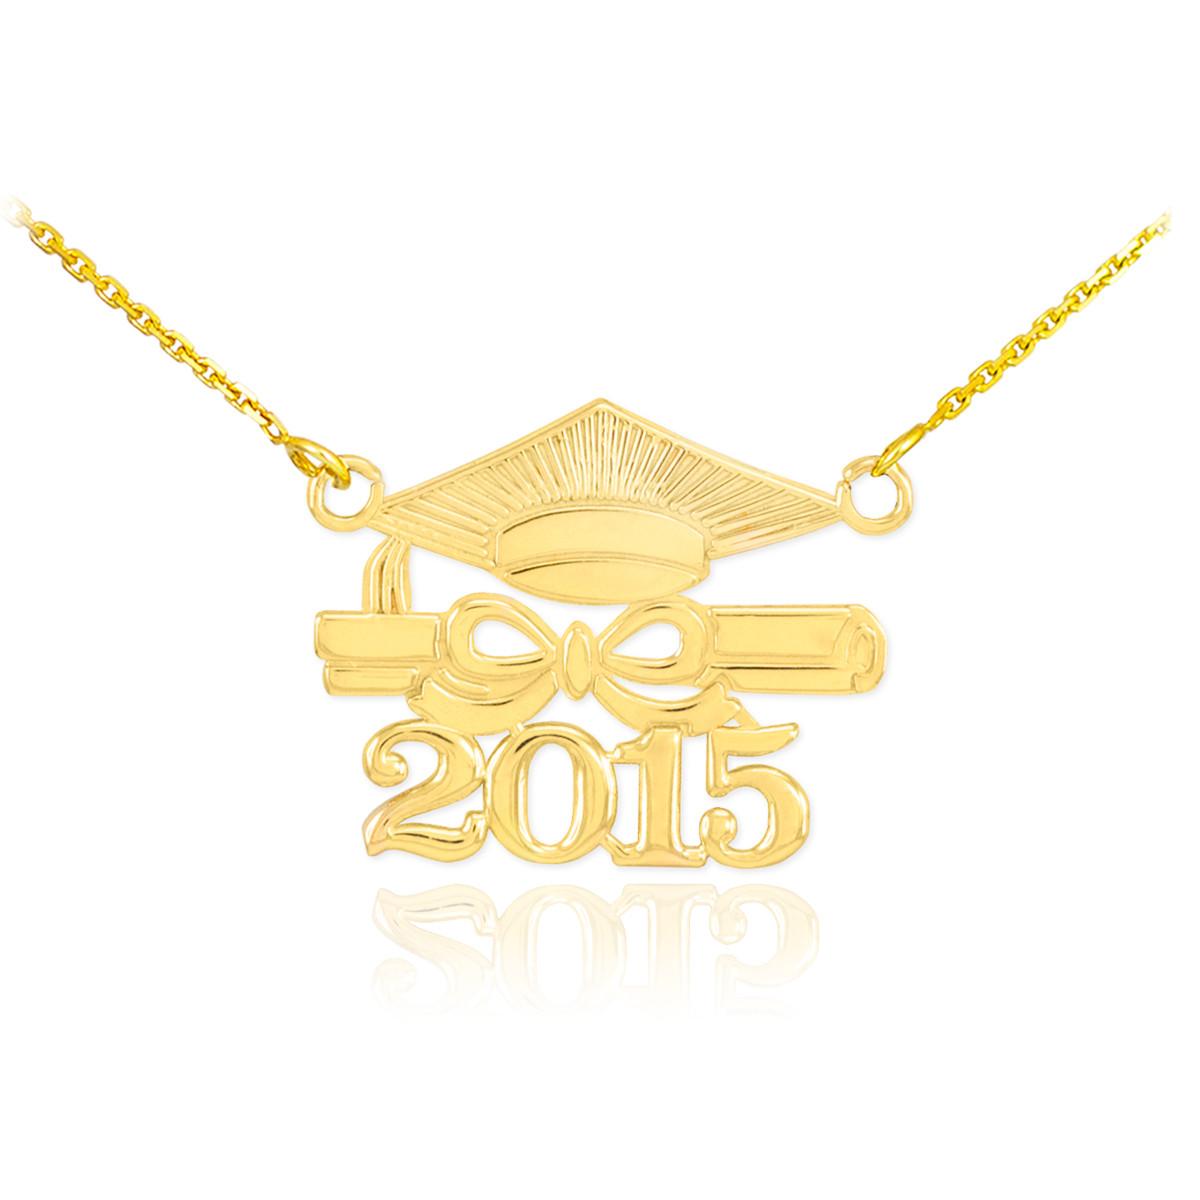 14k gold class of 2015 graduation mortar board pendant